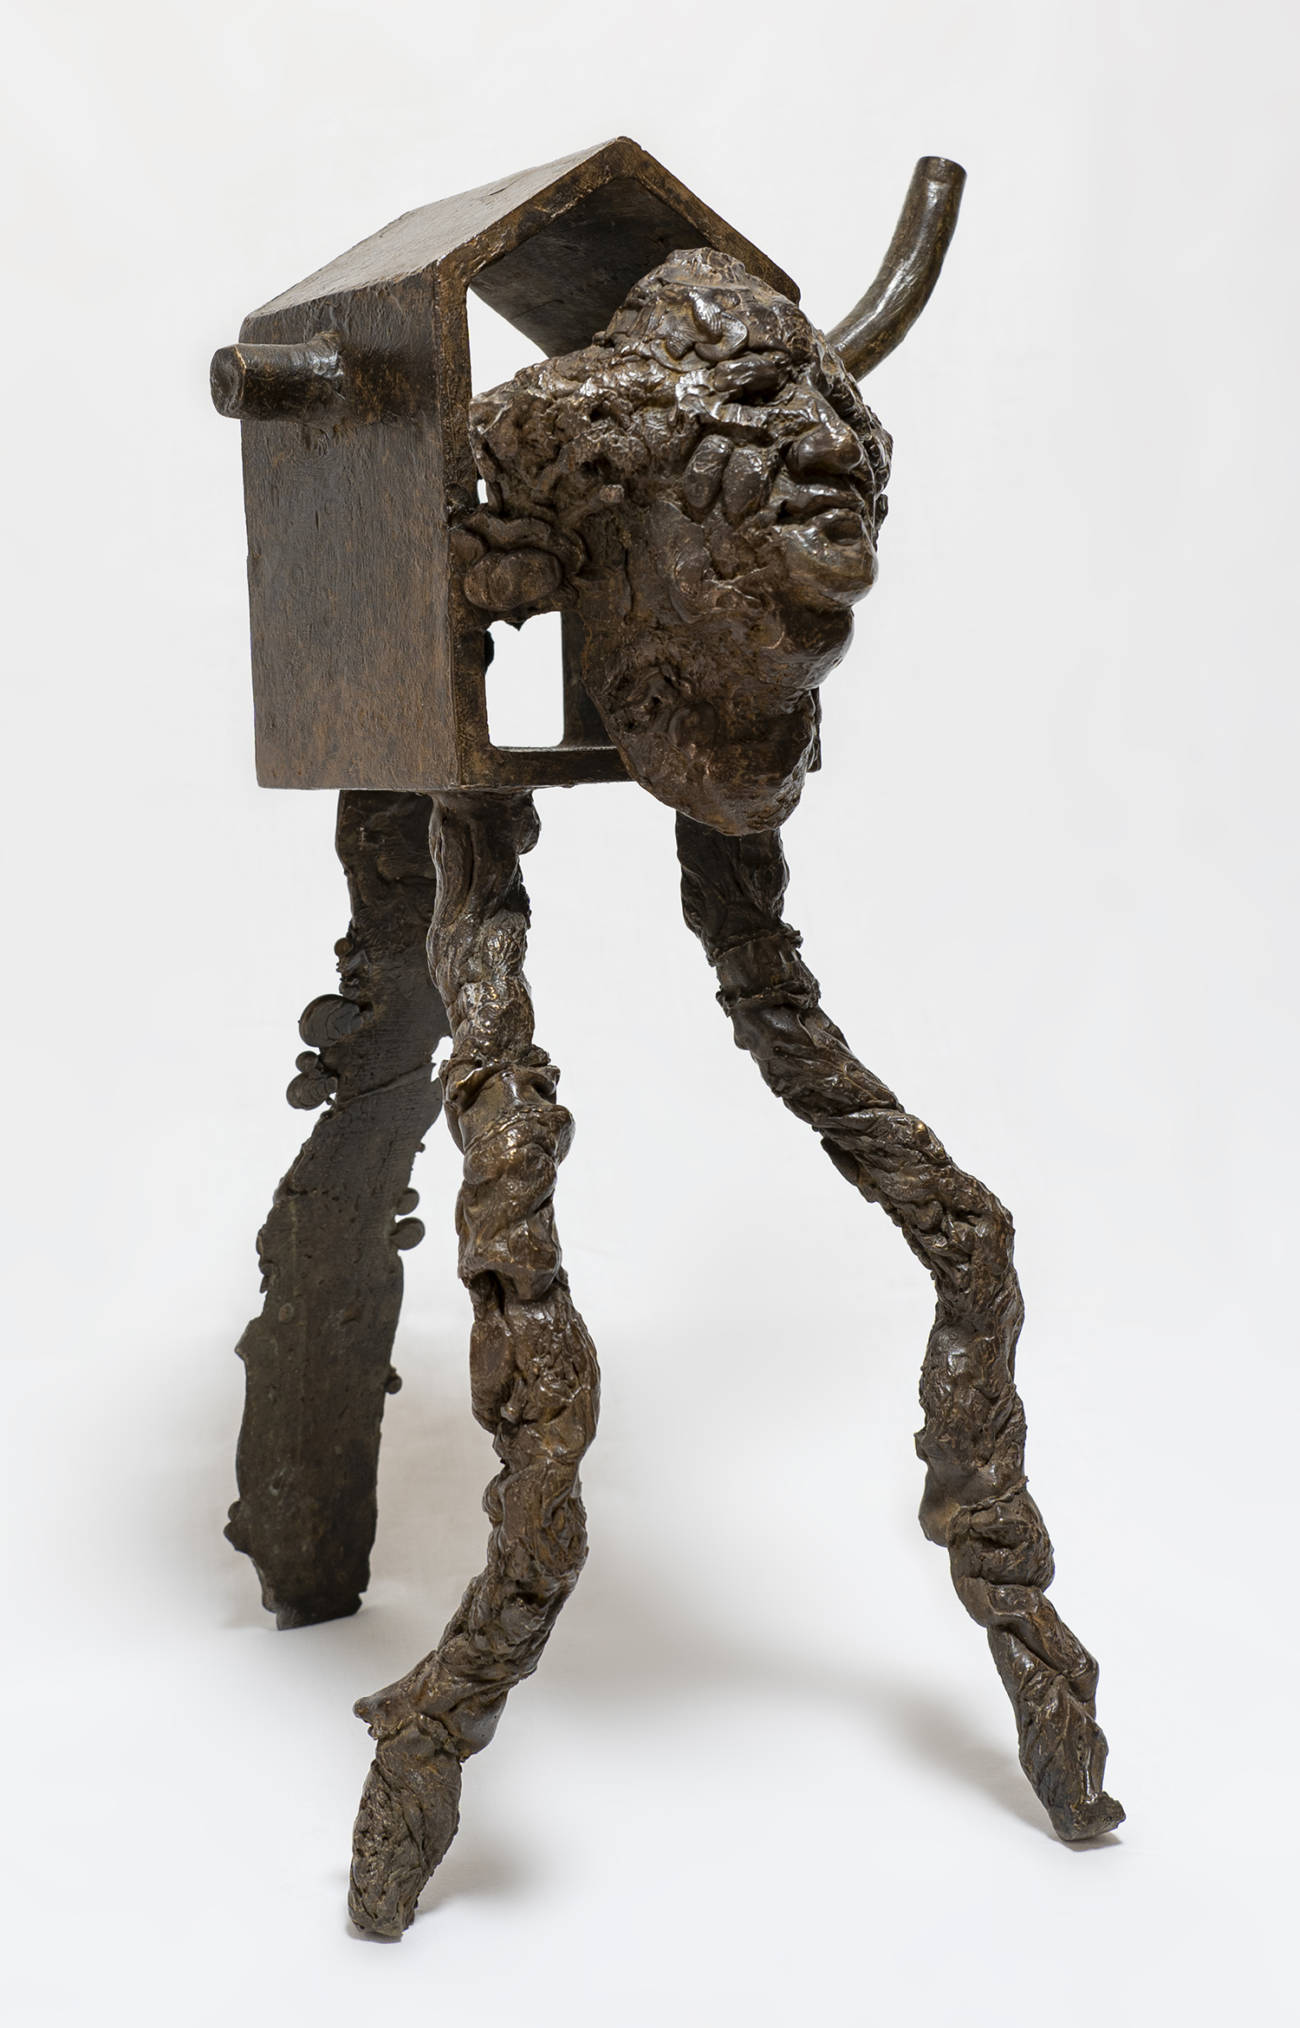 Gautier Ferrero, Kodama, 2020, Bronze. Courtesy de l'artiste et de la galerie Catherine Issert